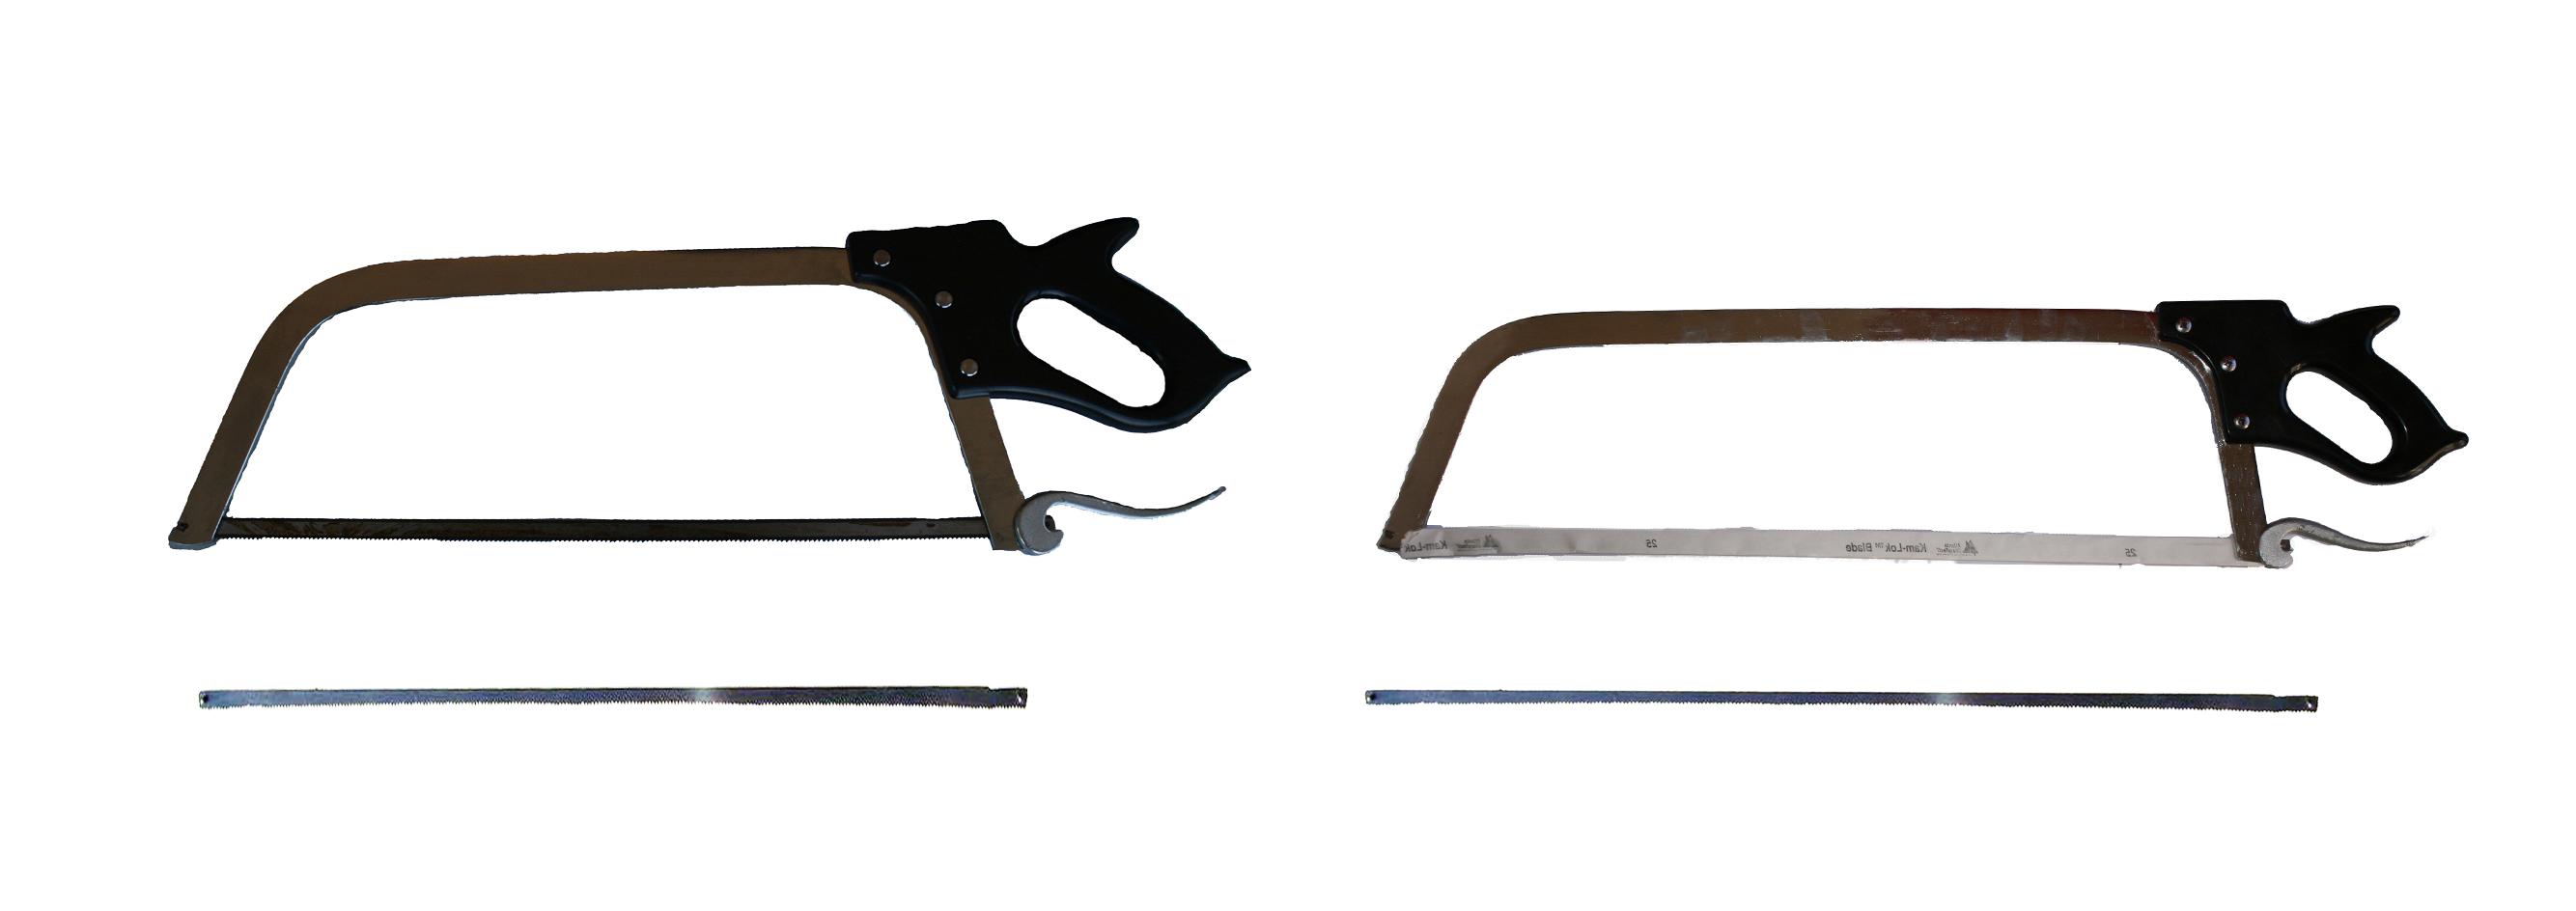 hand-saws-website.jpg